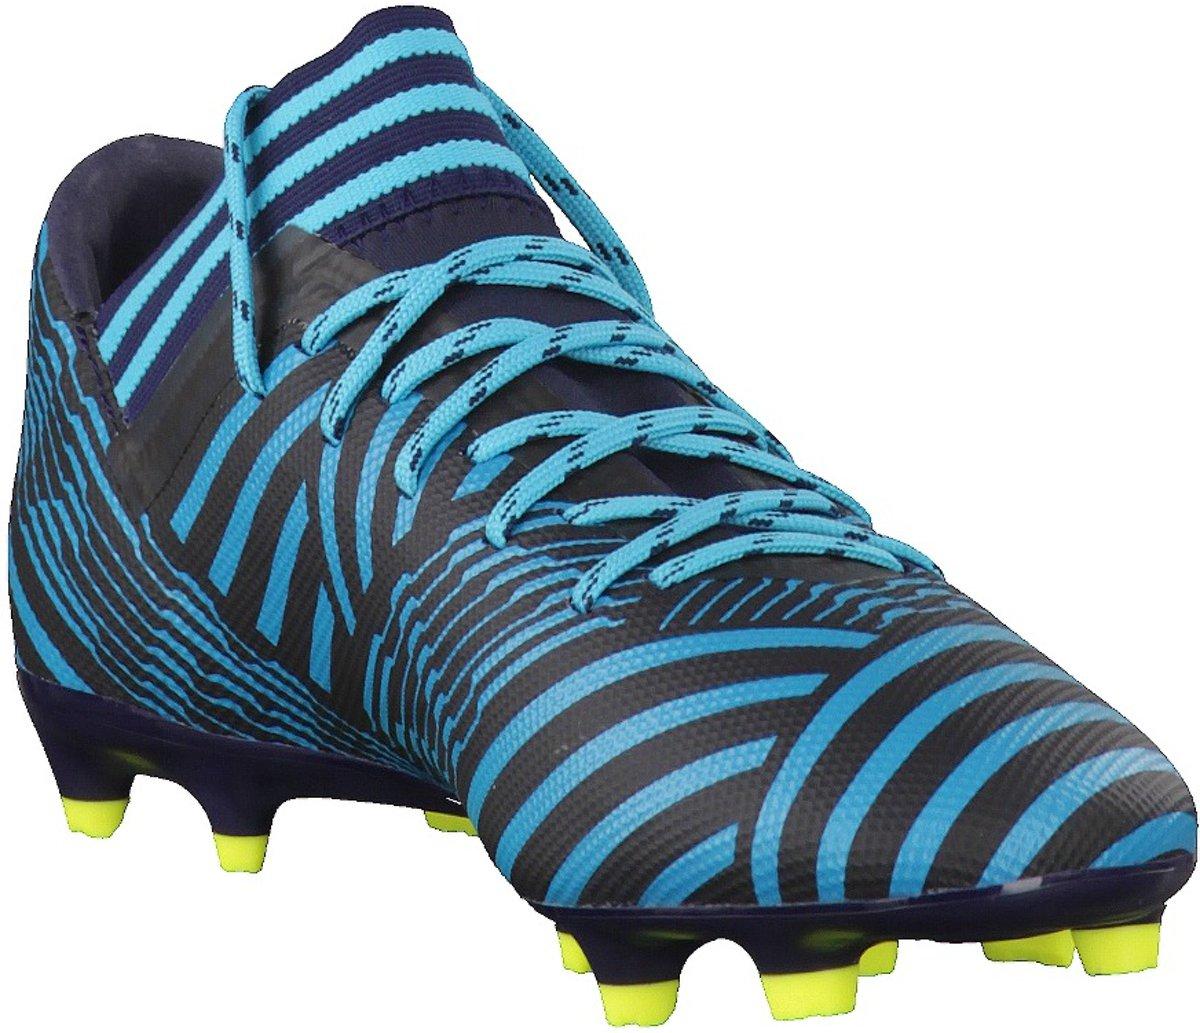 Adidas - Nemeziz 17,3 Soccer Fg - Unisexe - Football - Blanc - 41 1/3